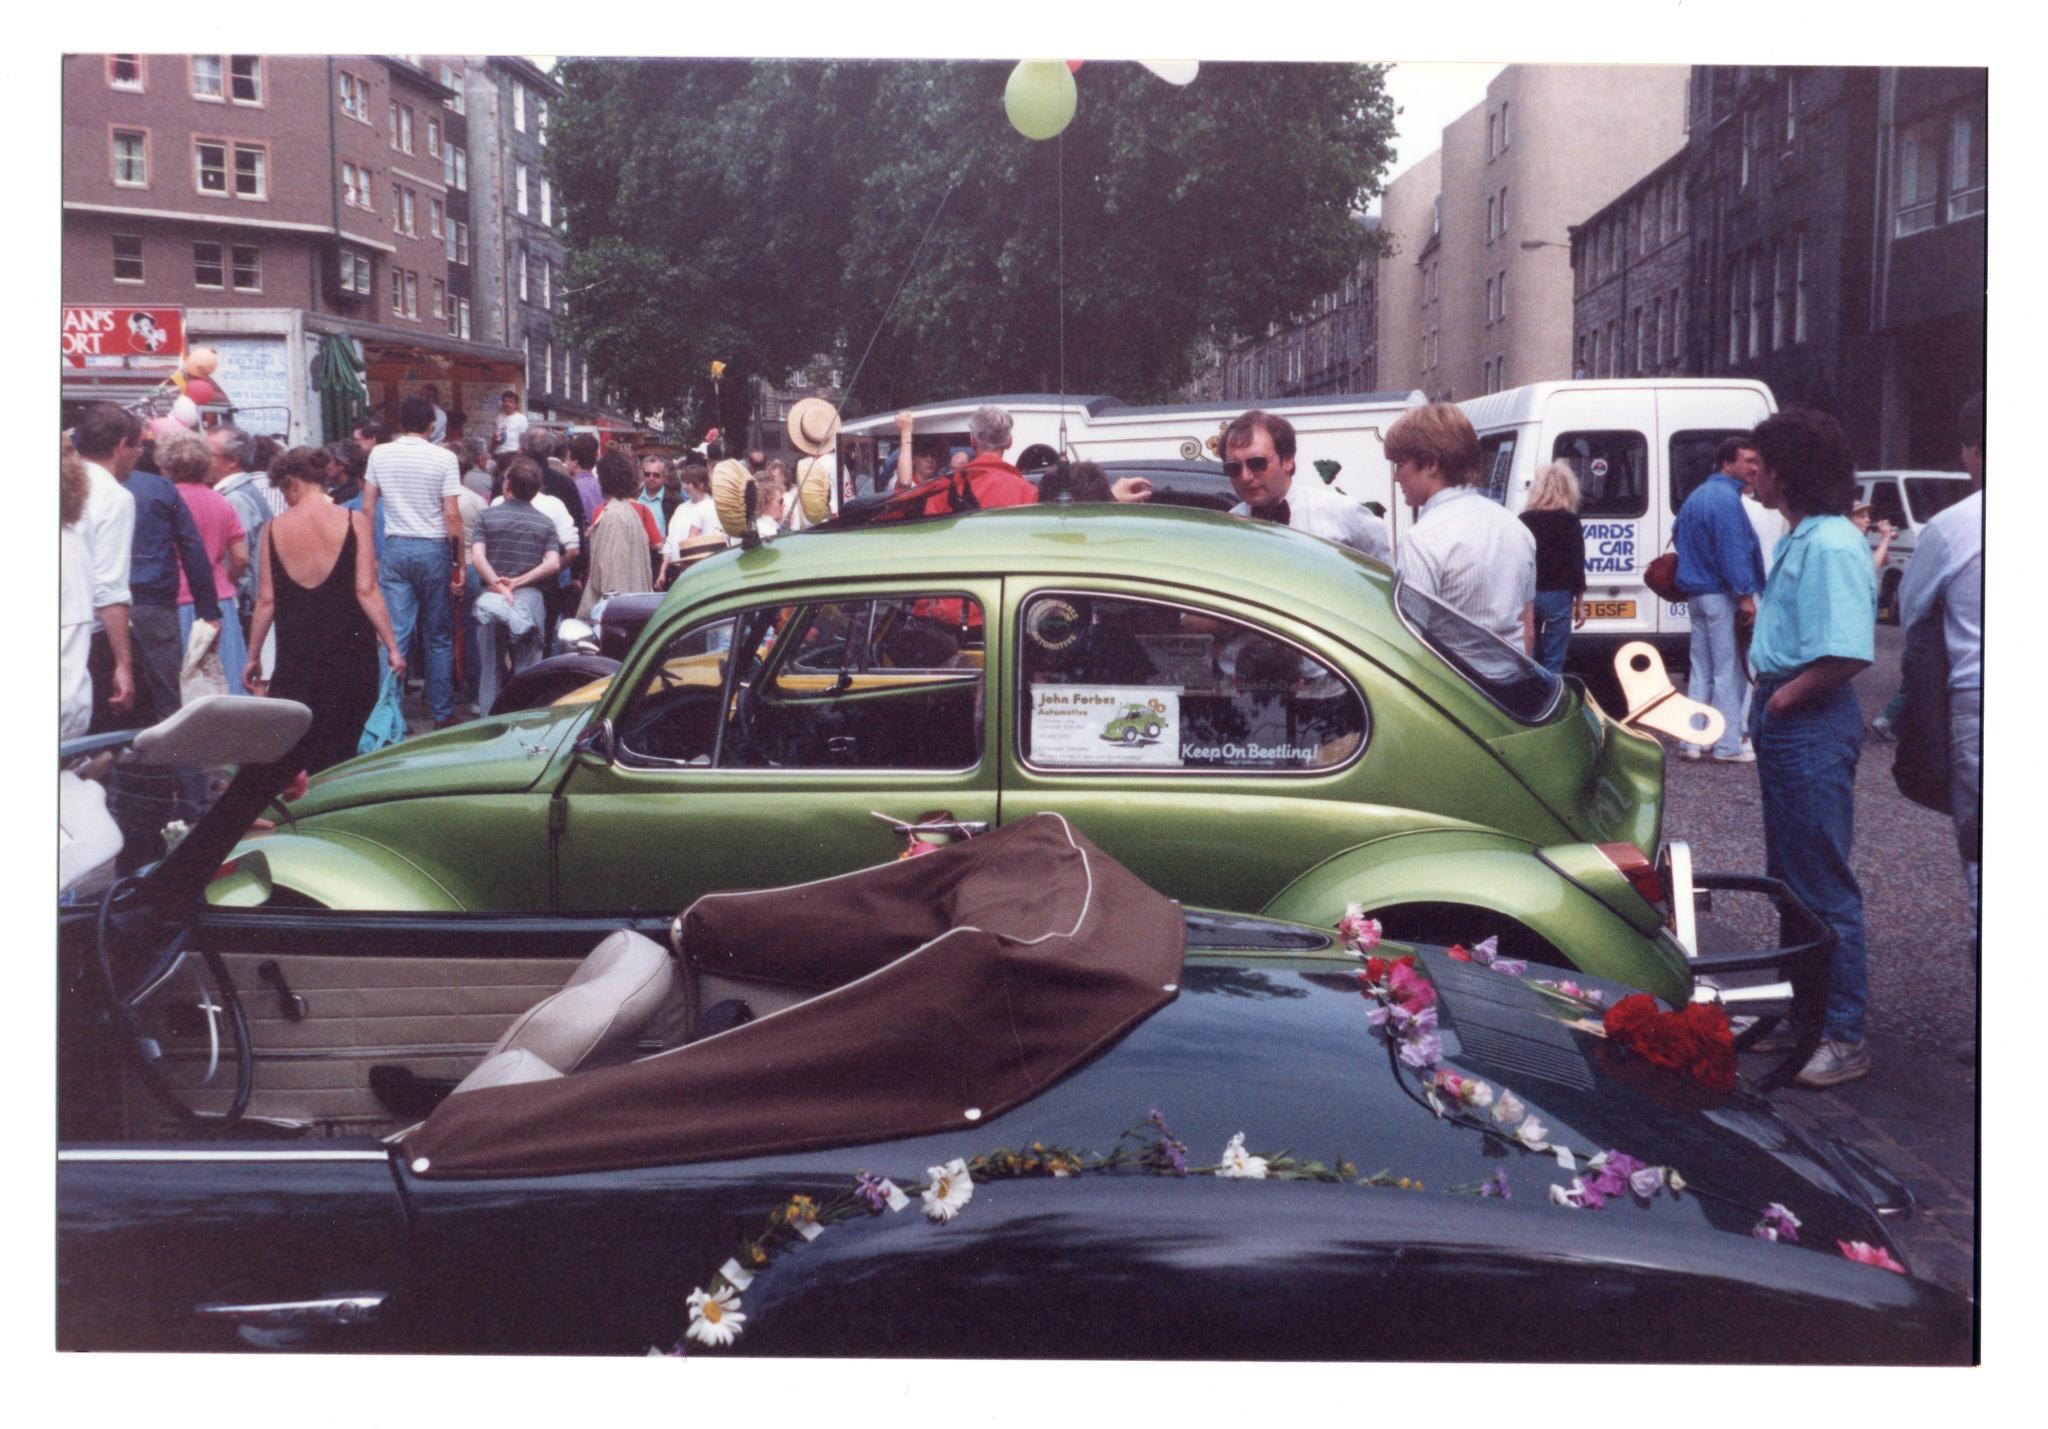 Grassmarket jazz festival crowd 1987